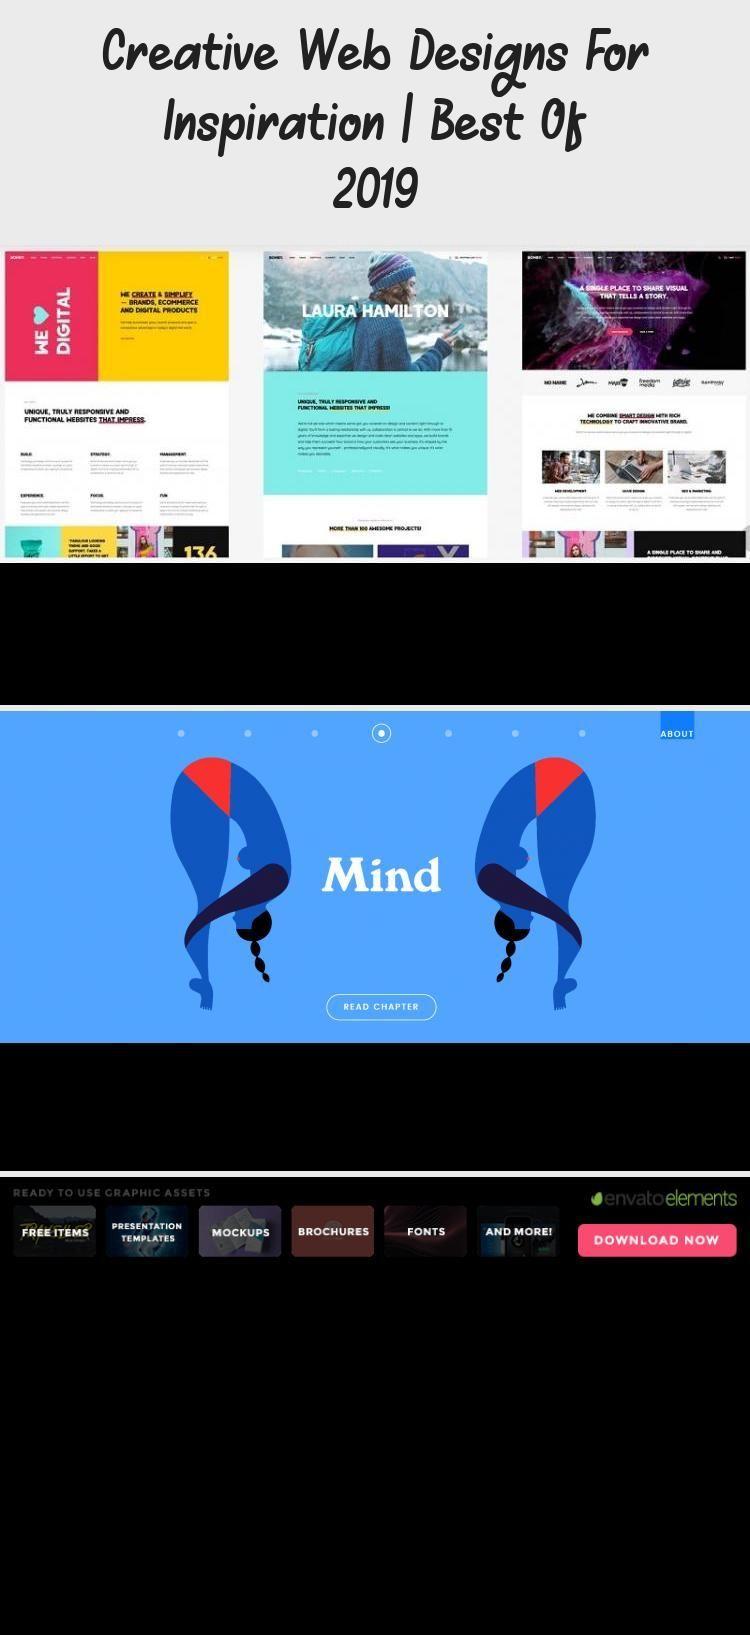 Creative Web Designs For Inspiration Best Of 2019 Design Creative Web Designs For Inspiration Best Of 2017 Webdesigncompany Creativewebdesign We En 2020 Blog